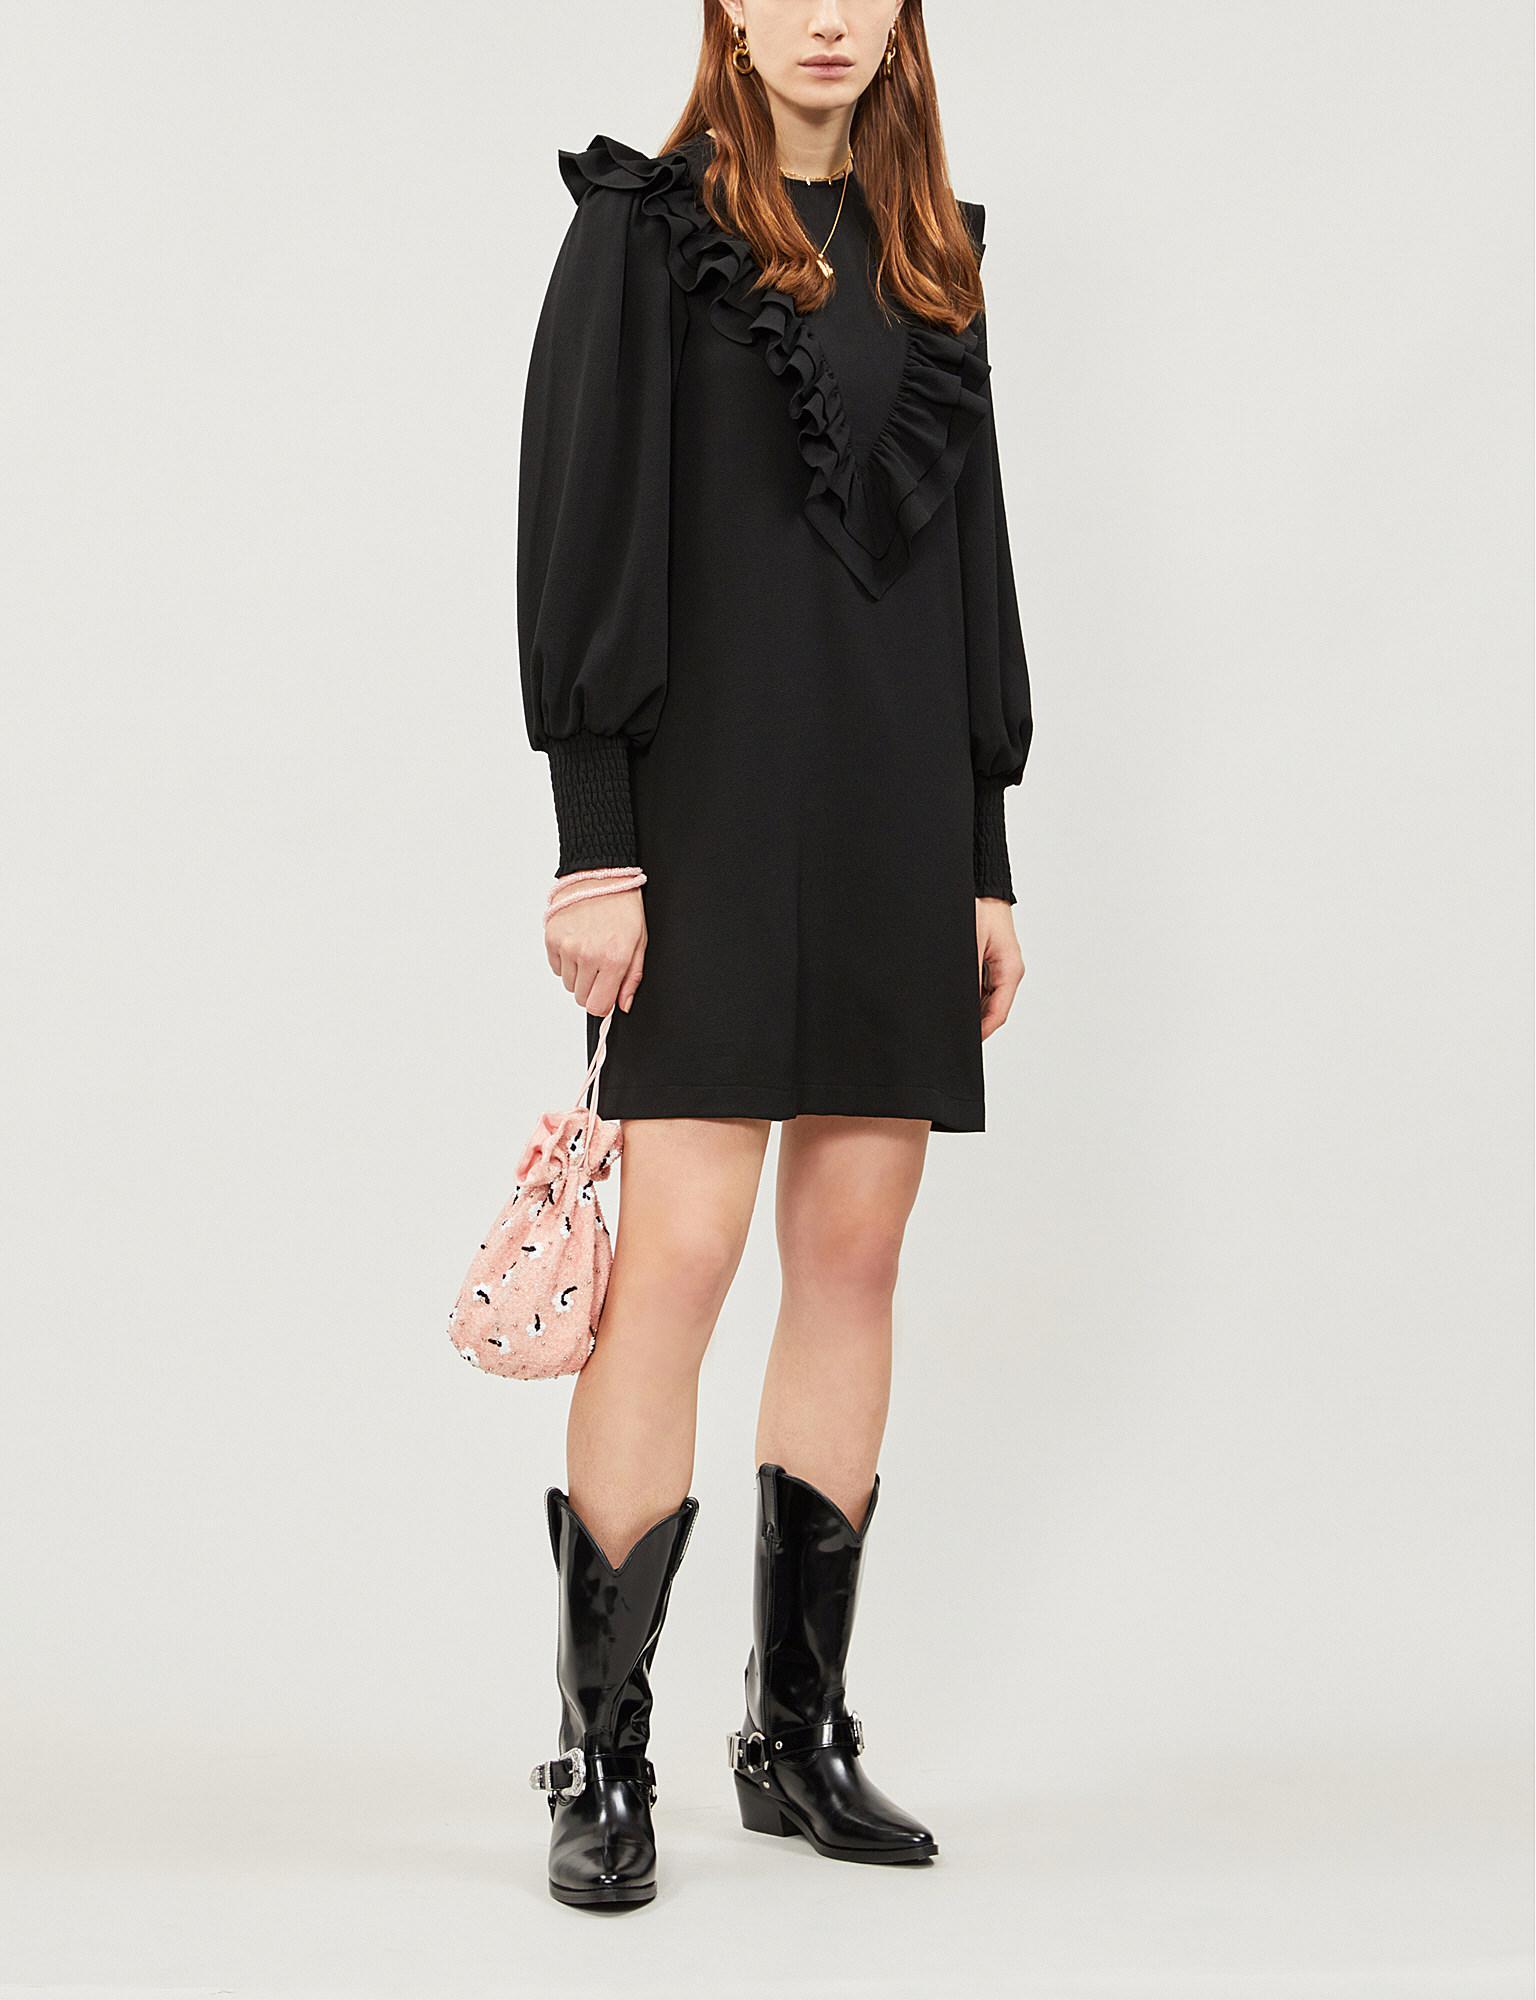 Ganni - Black Ruffled Stretch-crepe Mini Dress - Lyst